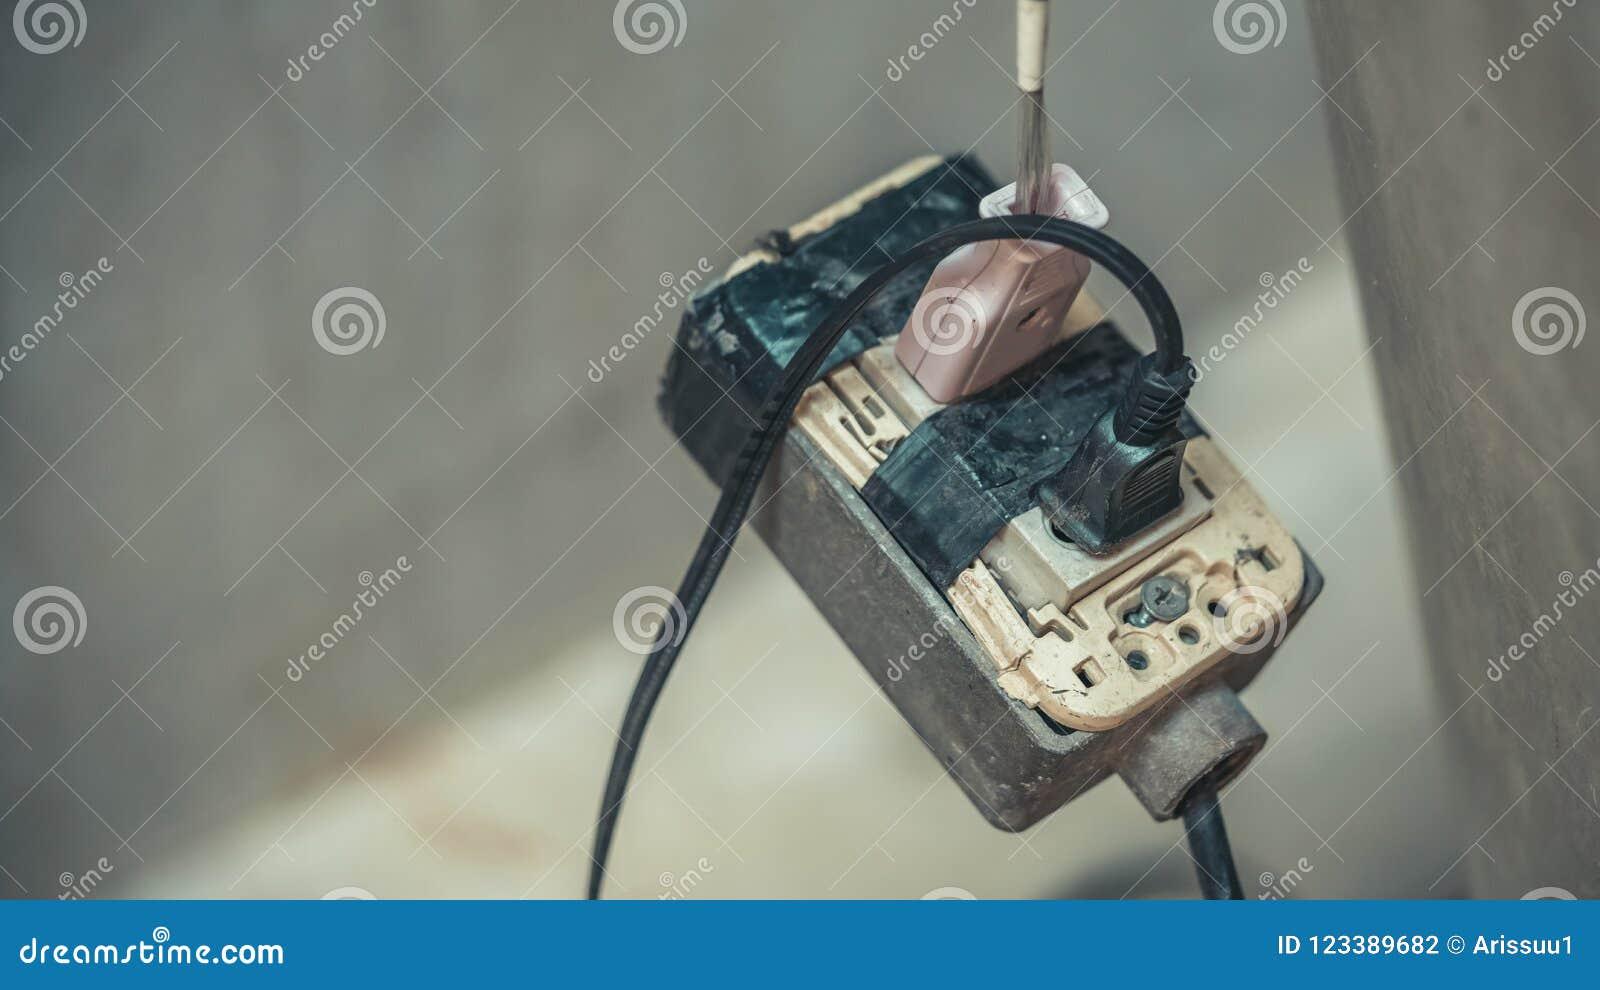 Portable Electric Equipment Plugs